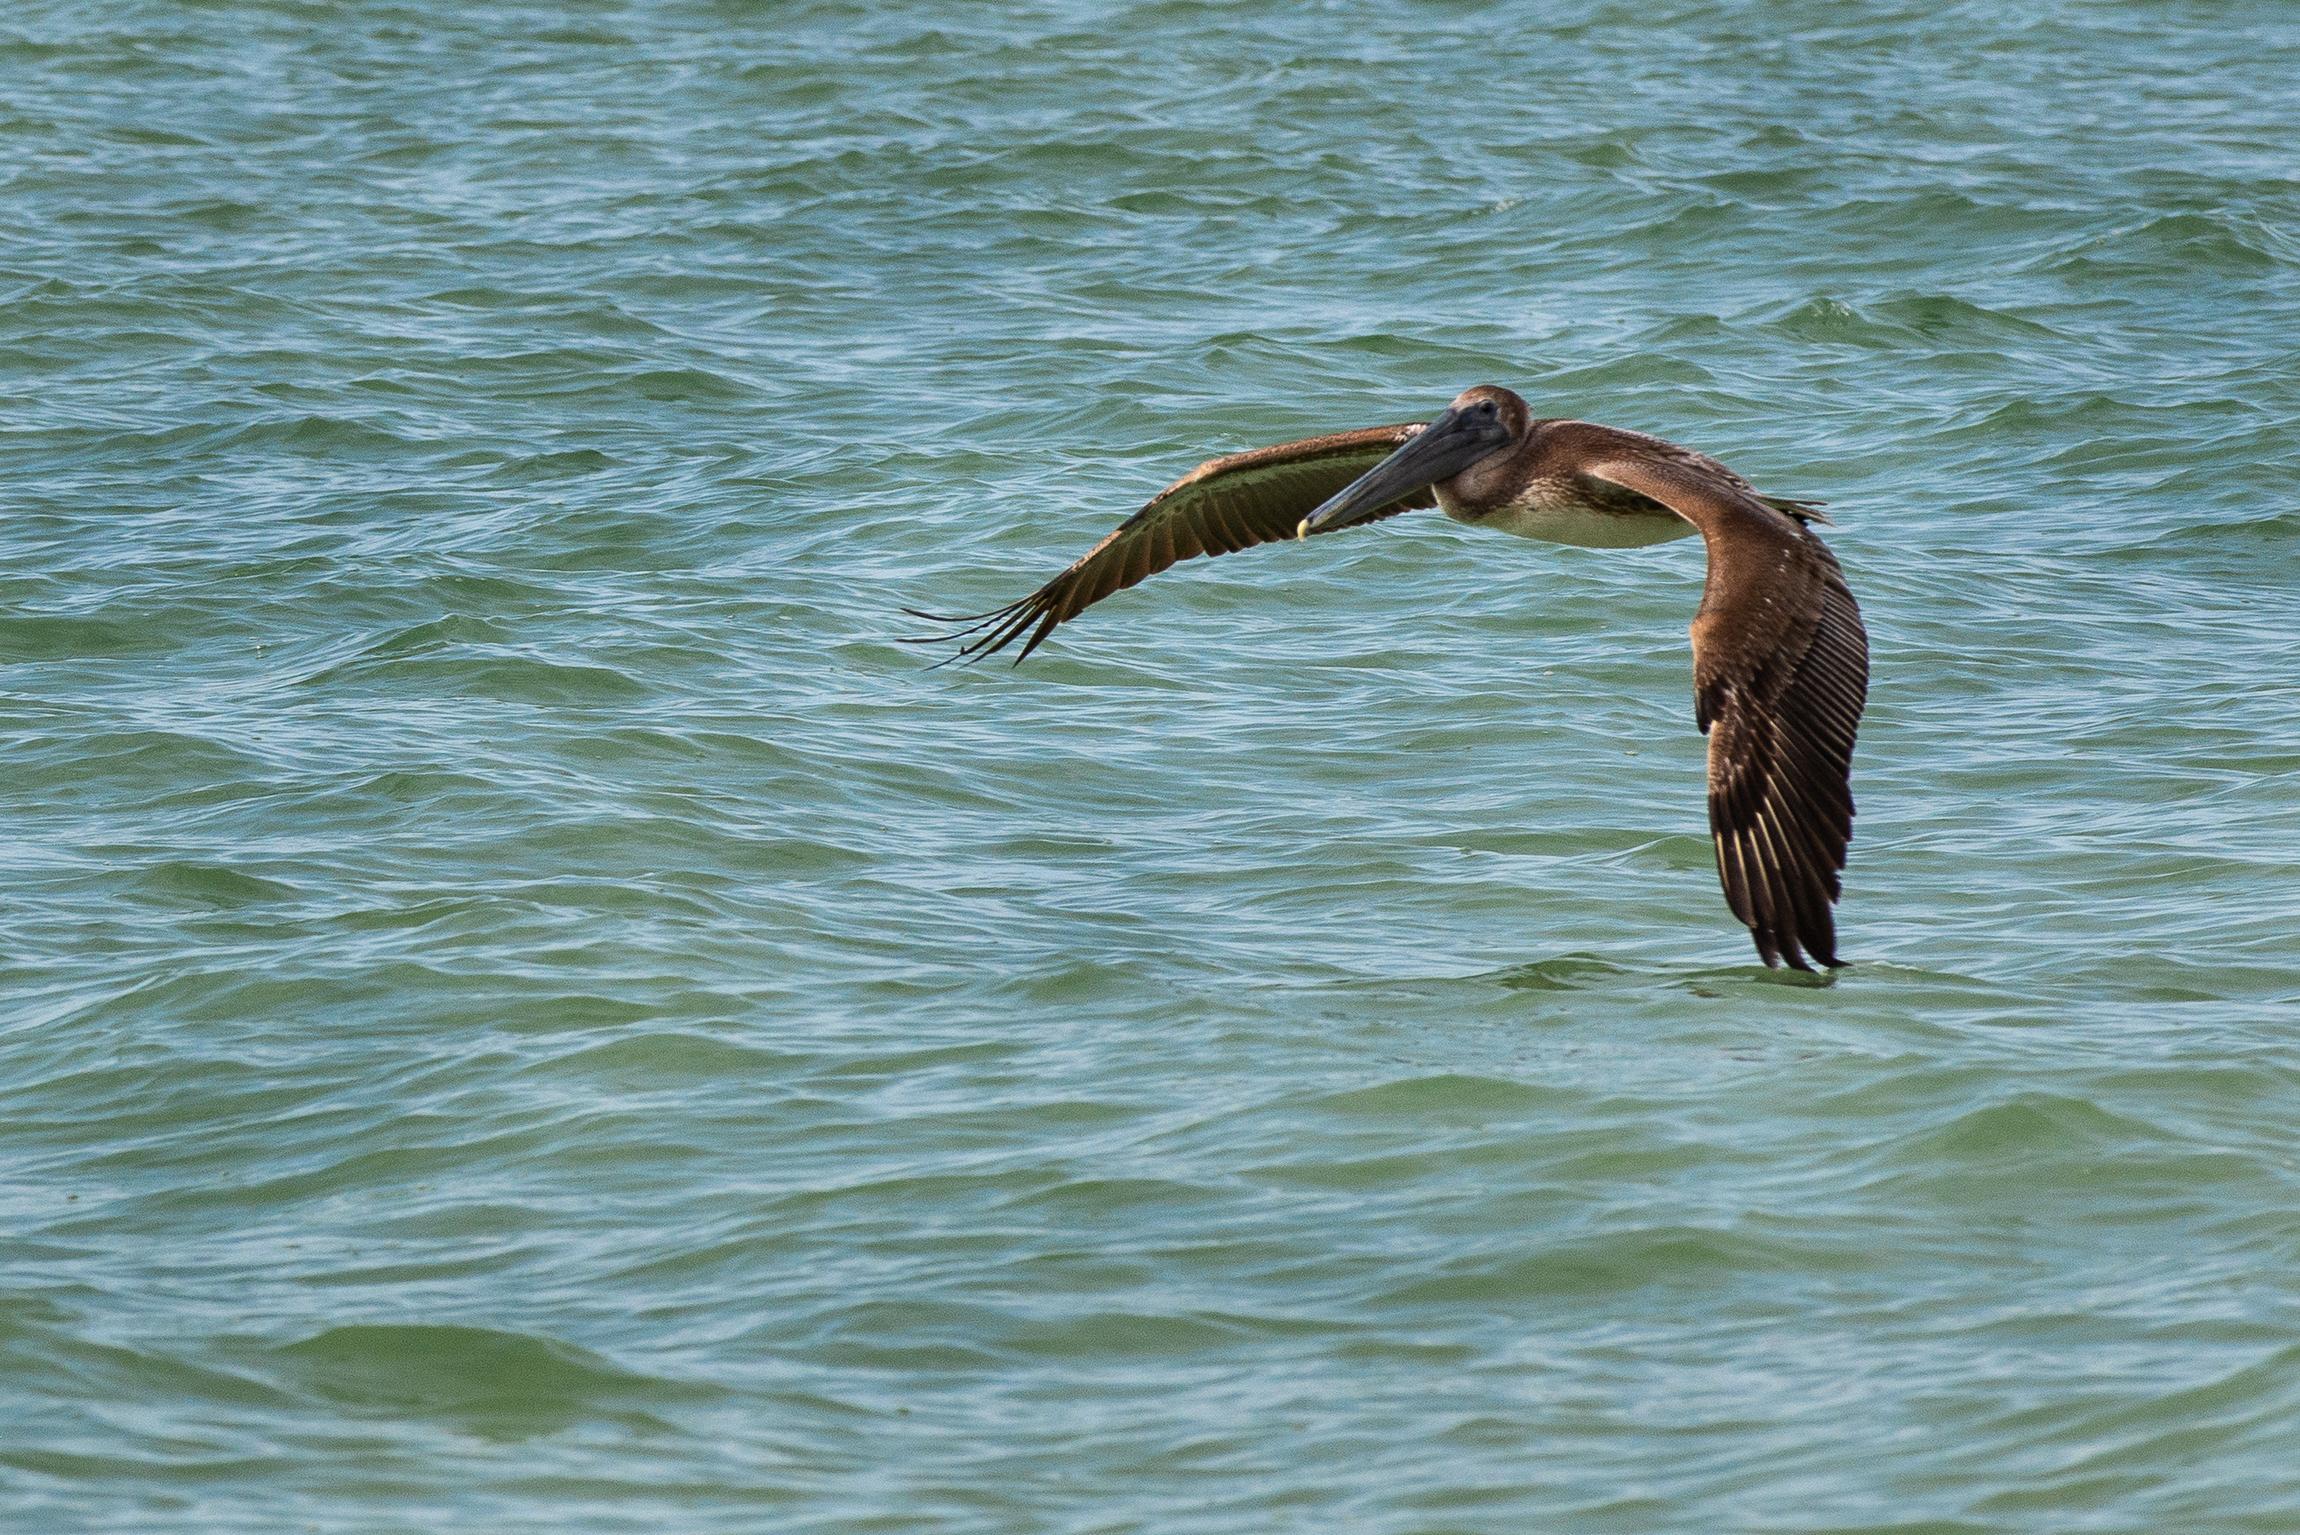 #pelican, #brownpelican, #florida, #beach, #gulf, #naples, #flight, #inflight, #birdphotography, #wildlifephotography